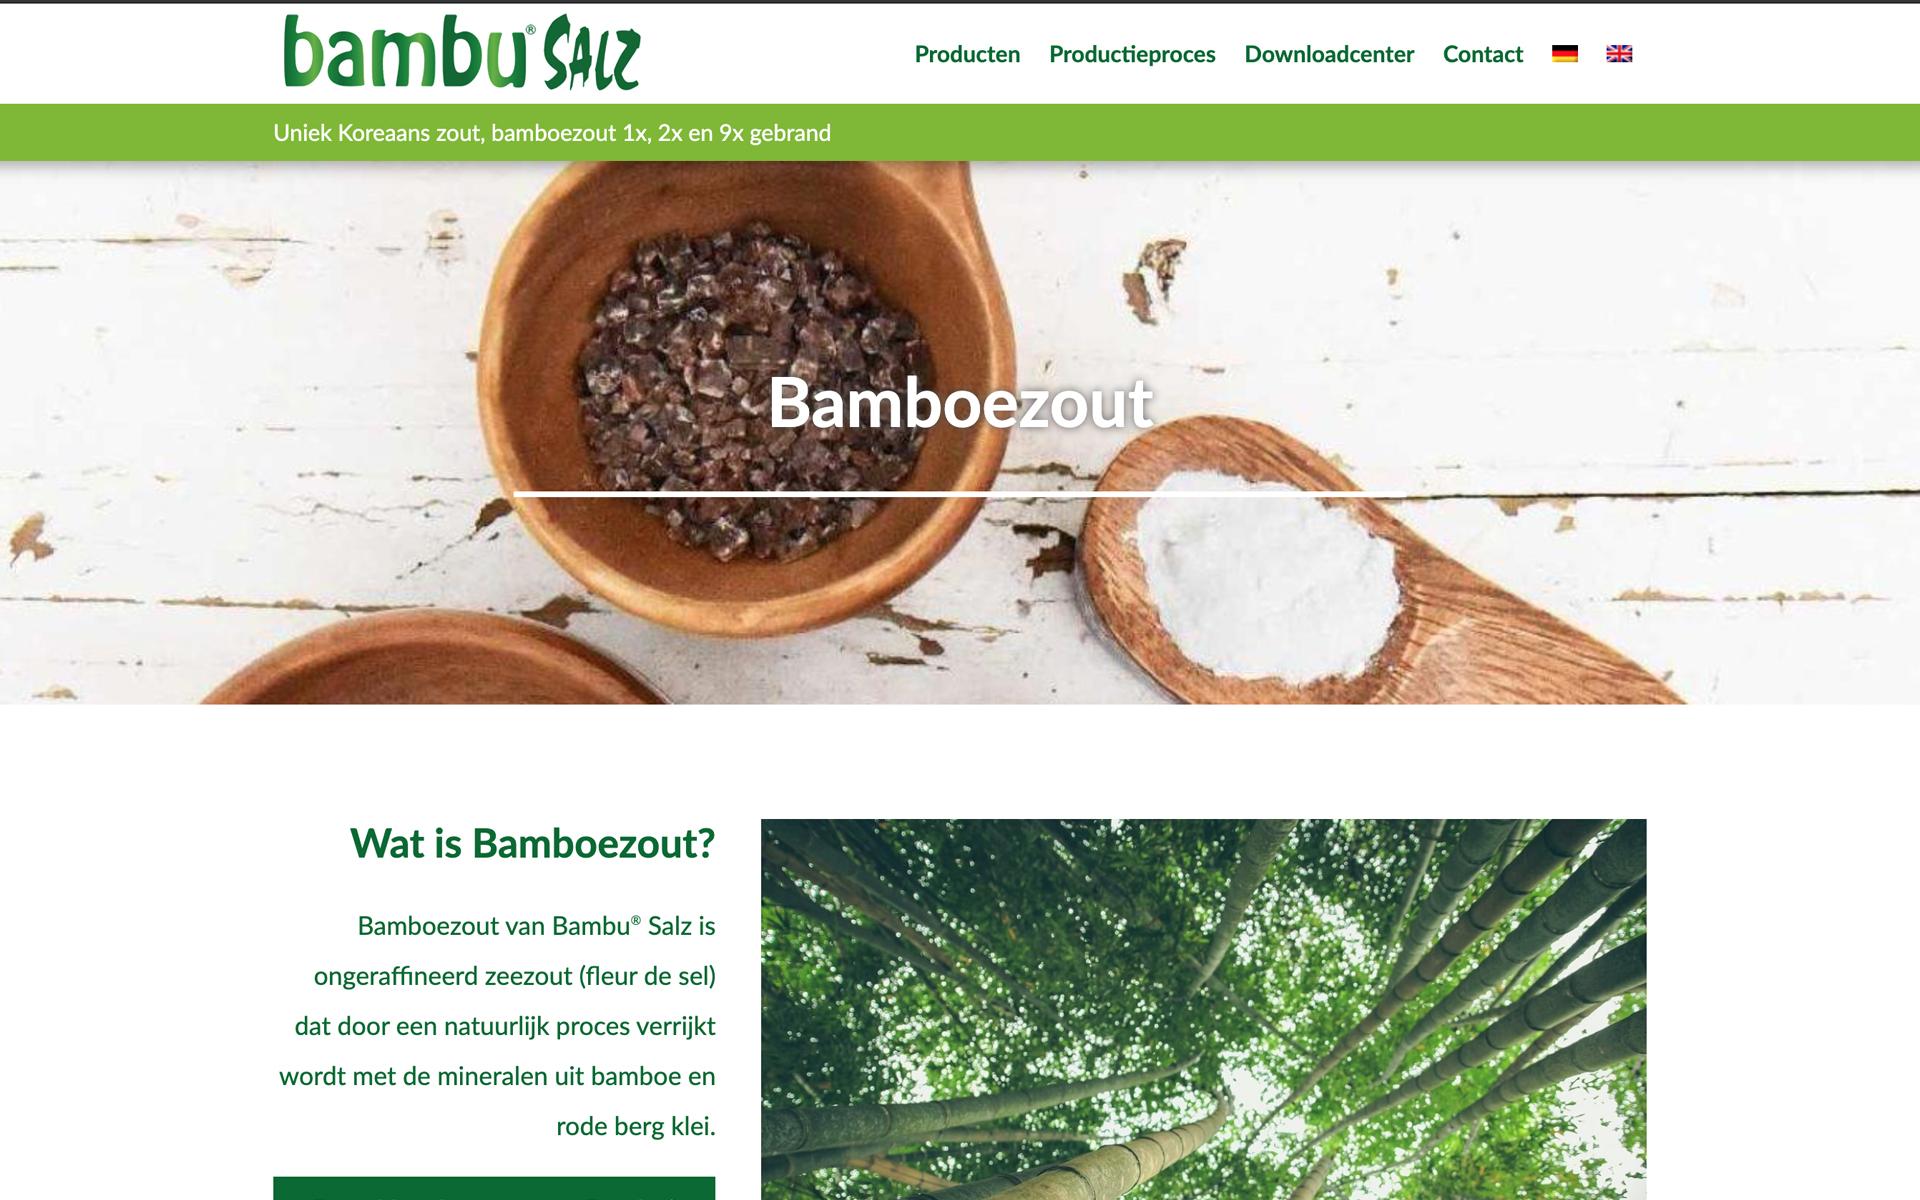 Bambusalz - Uniek Koreaans gebrand bamboezout desktop preview